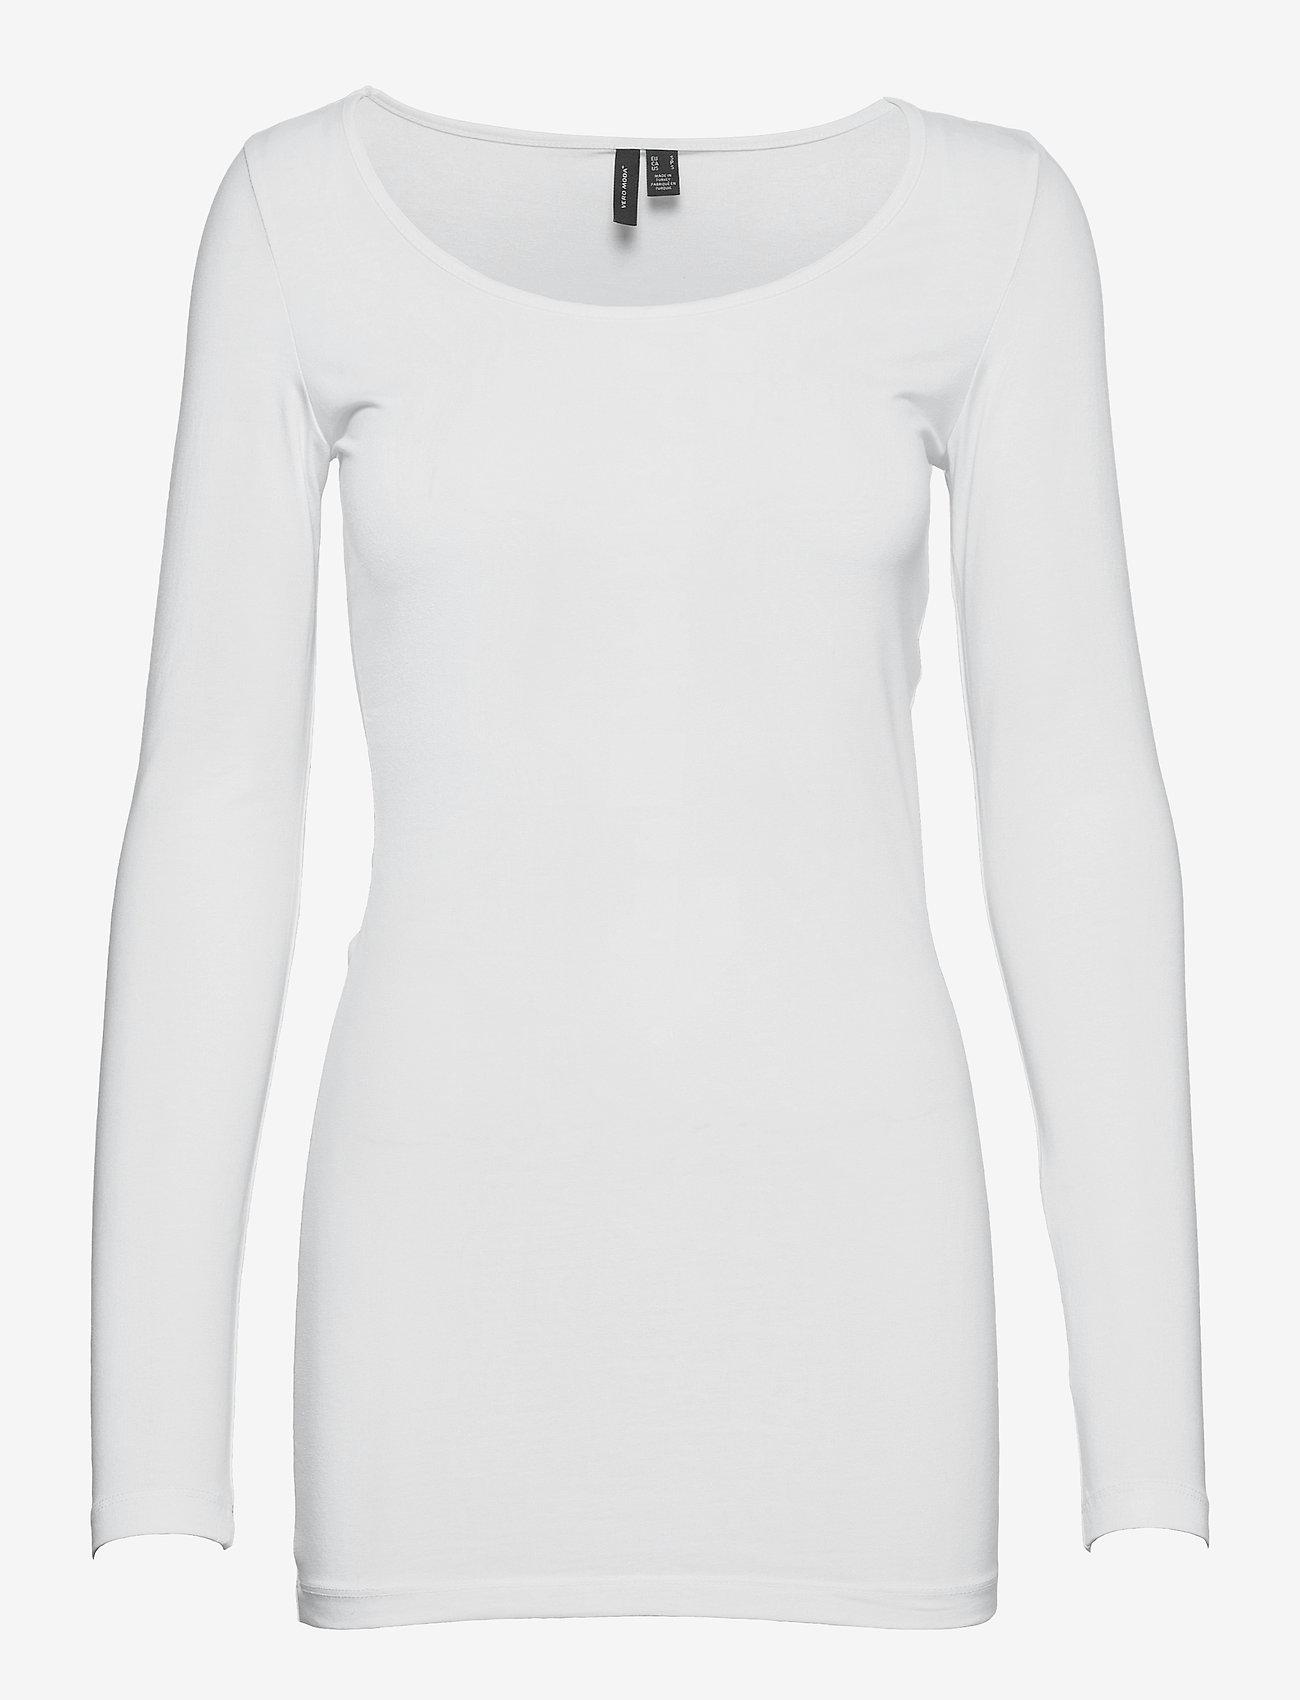 Vero Moda - VMMAXI MY LS SOFT LONG U-NECK GA - långärmade toppar - bright white - 0